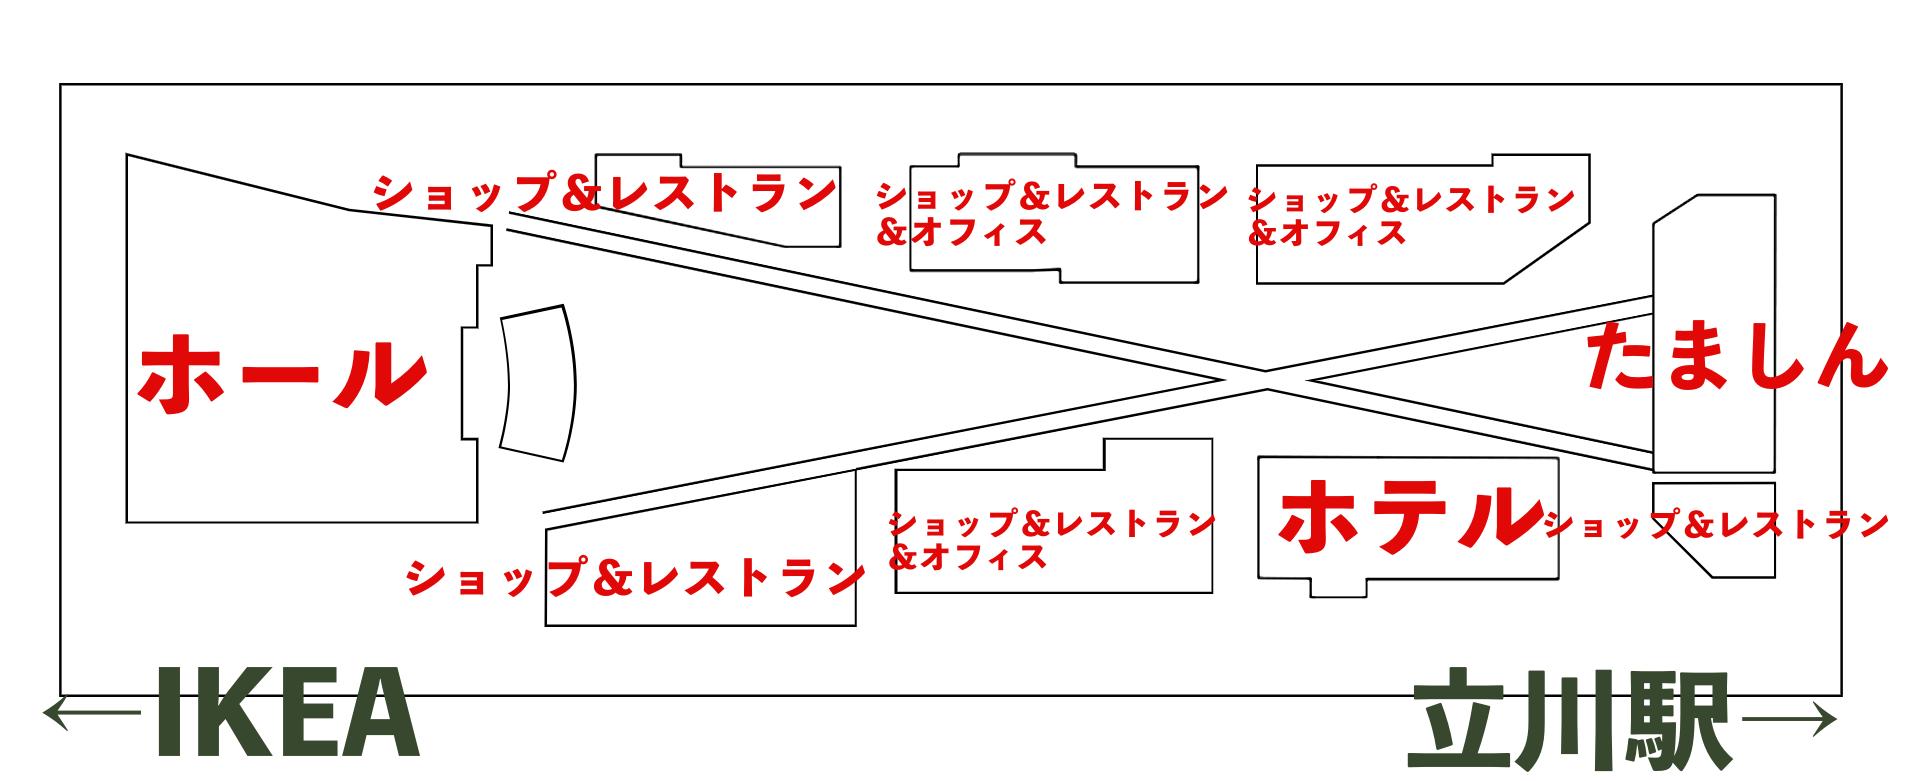 GREEN SPRINGSの配置図